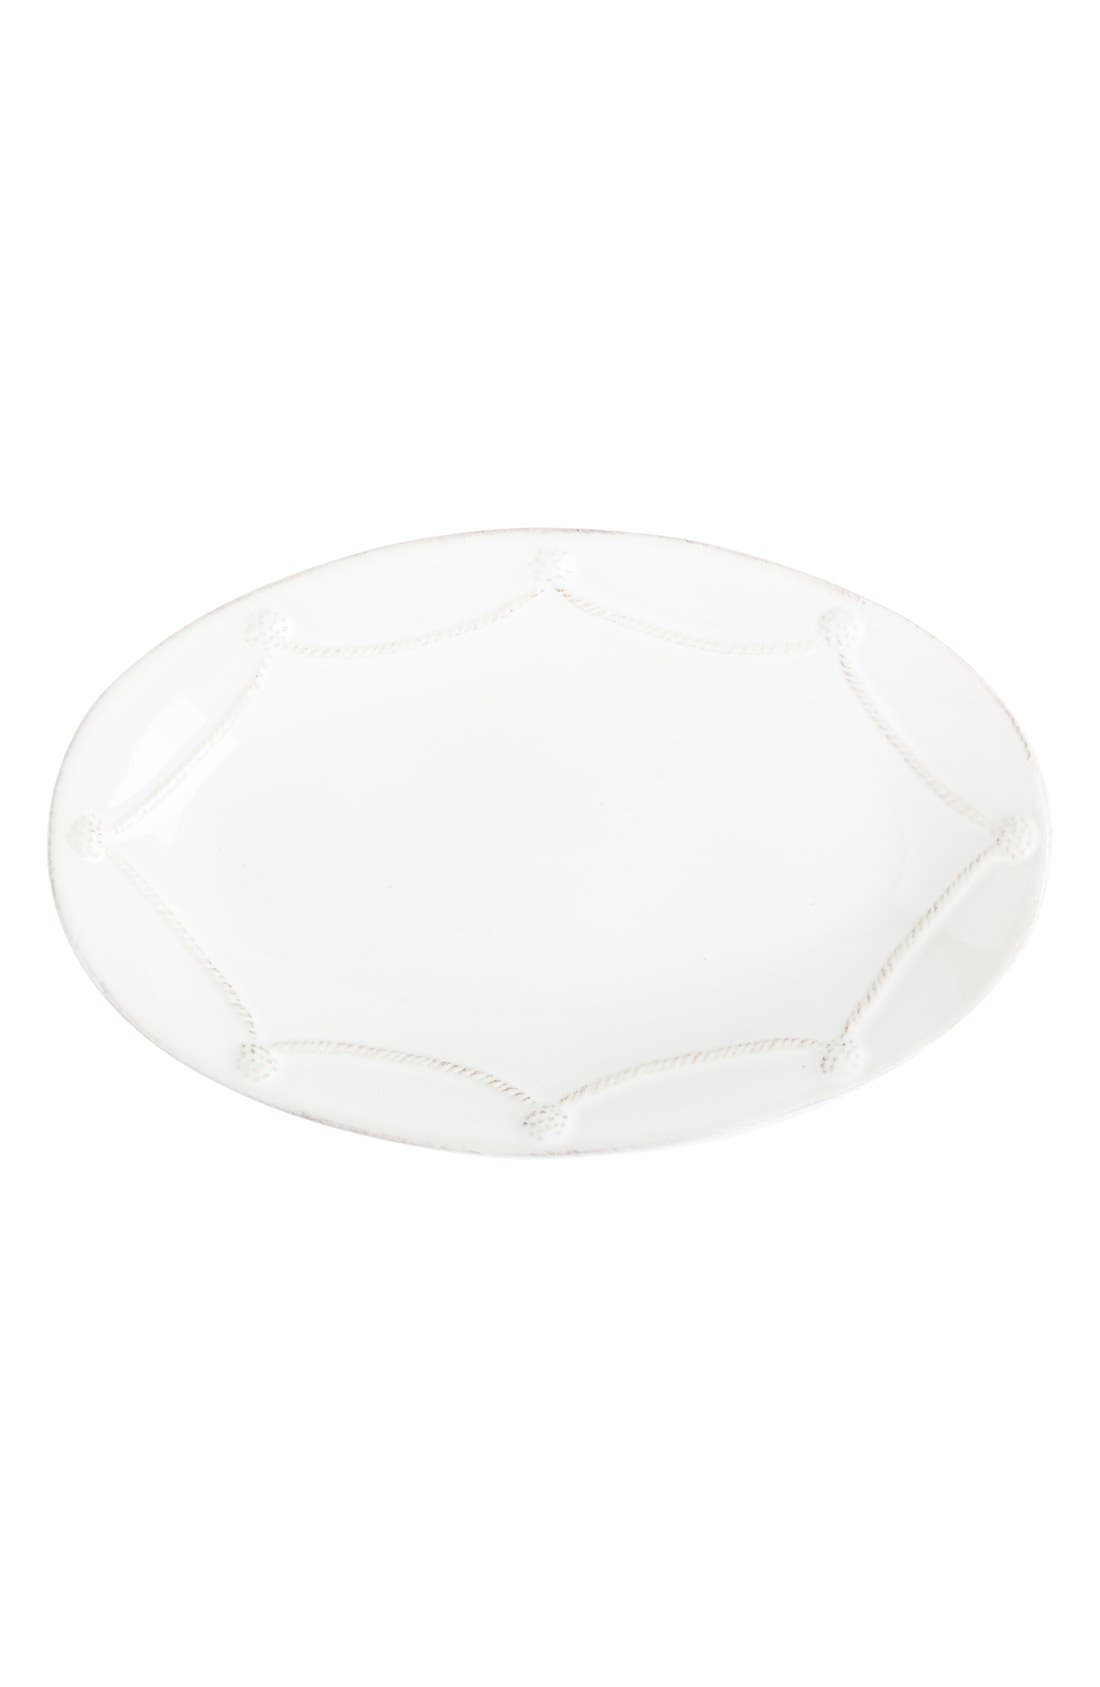 Alternate Image 1 Selected - Juliska'Berry and Thread' Oval Platter